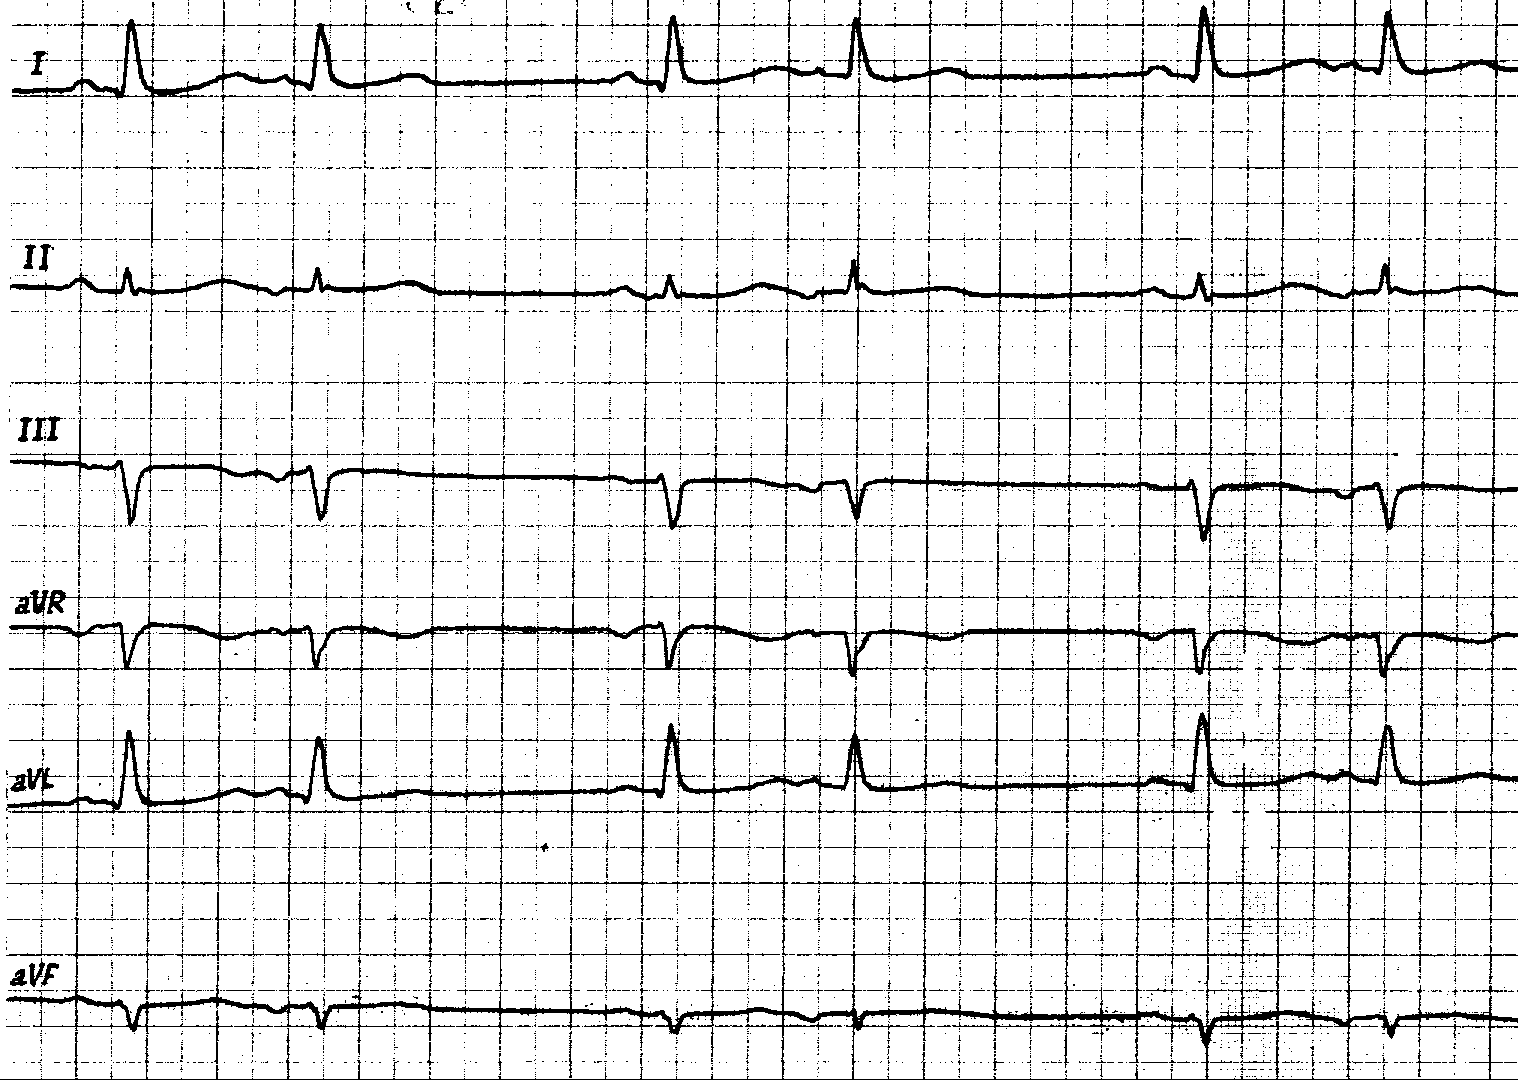 реферат экг диагностика инфаркта миокарда